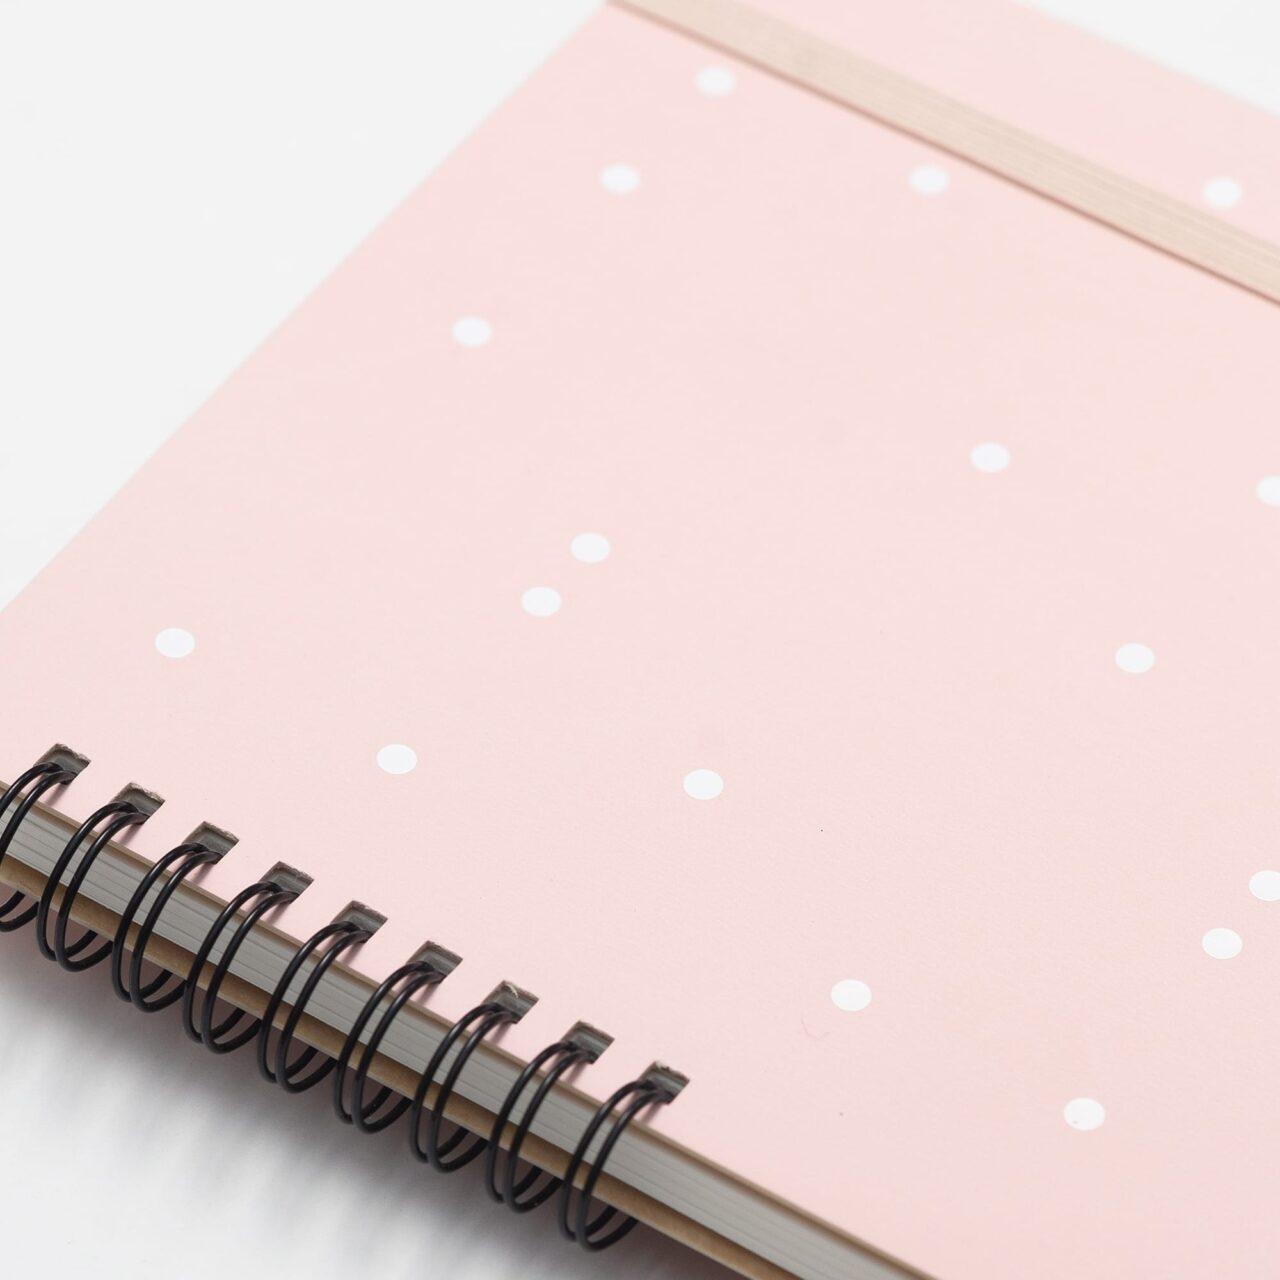 Скетчбук для смешанных техник A5, 180 г/м², 25 листов, розовый